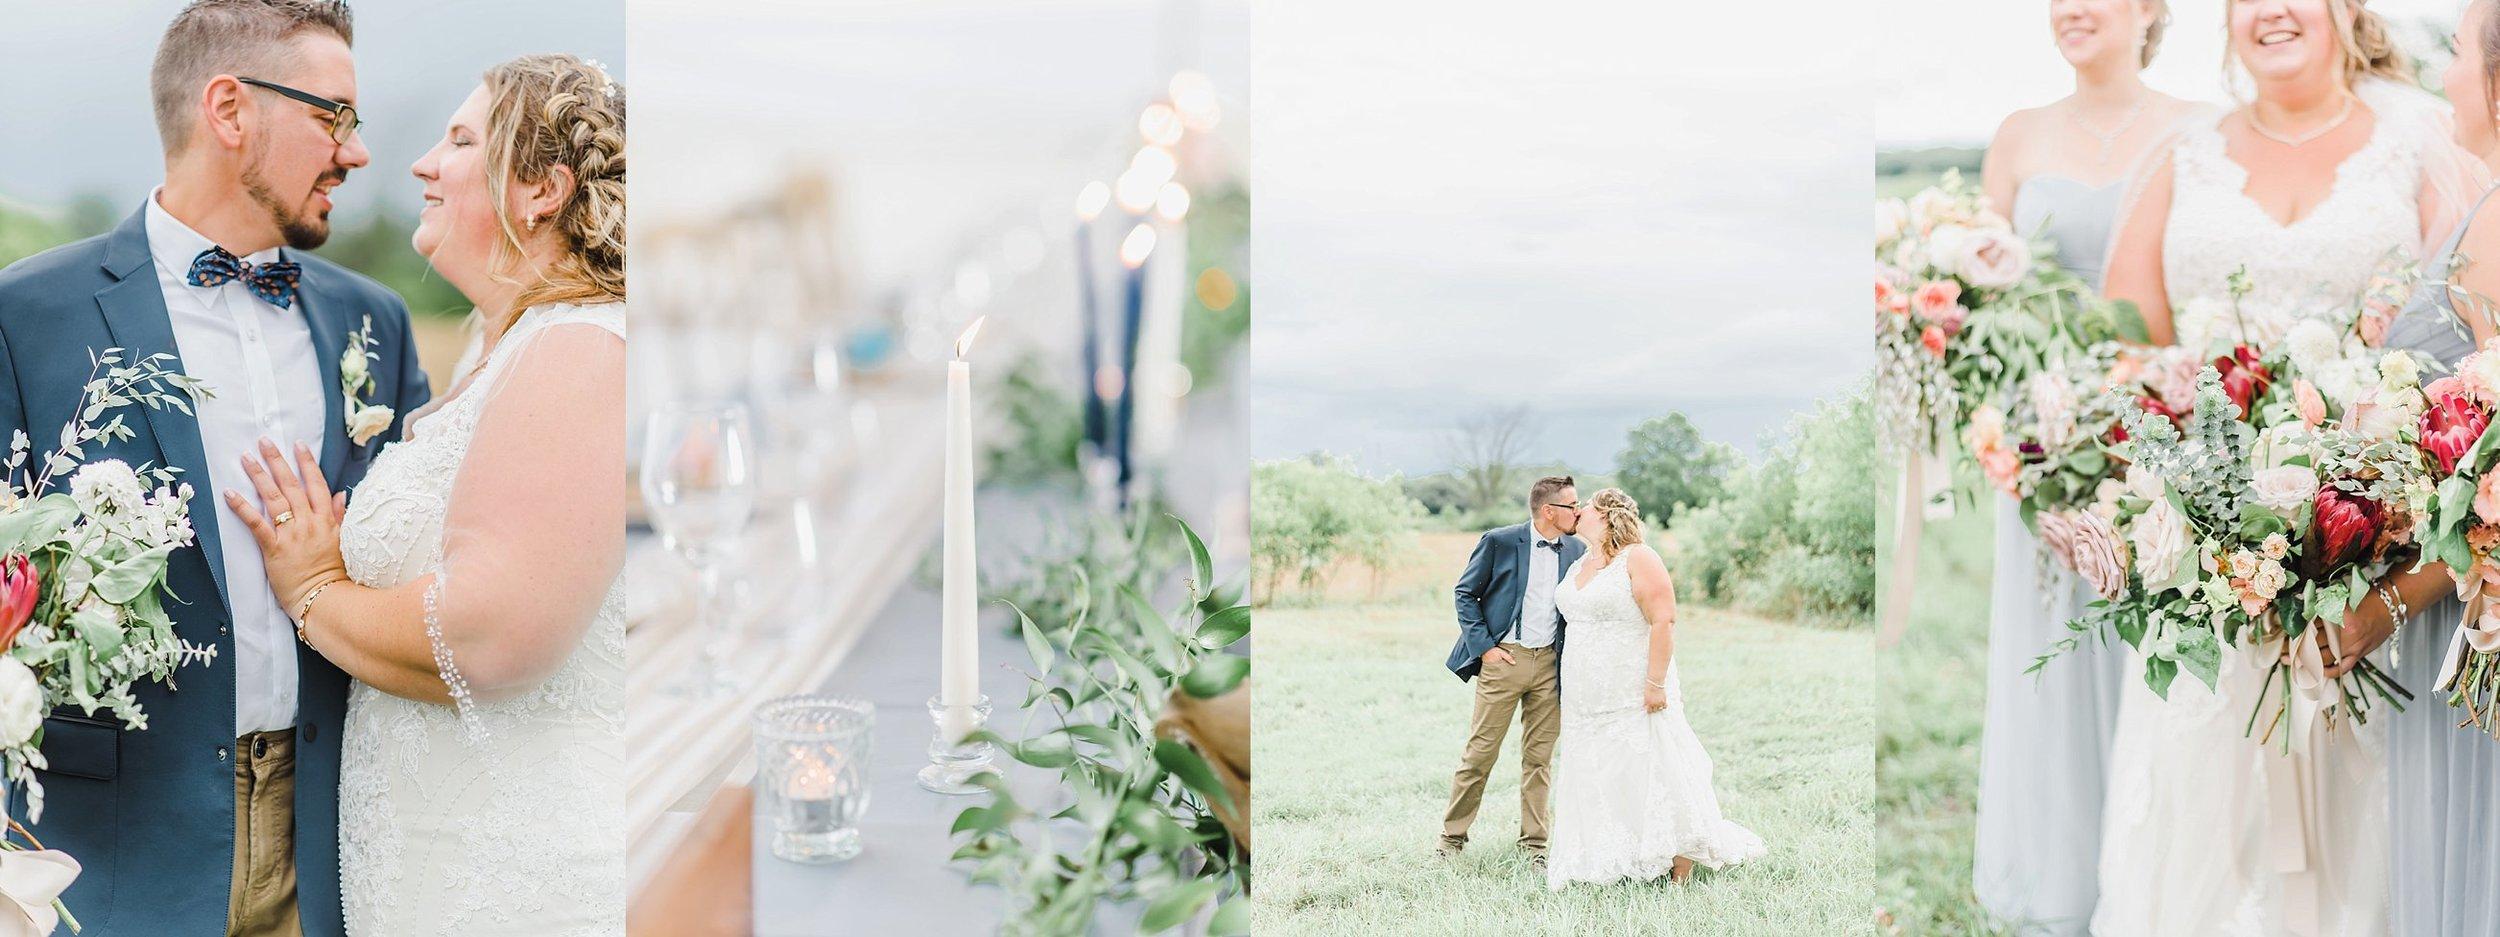 light airy indie fine art ottawa wedding photographer | Ali and Batoul Photography_0607.jpg